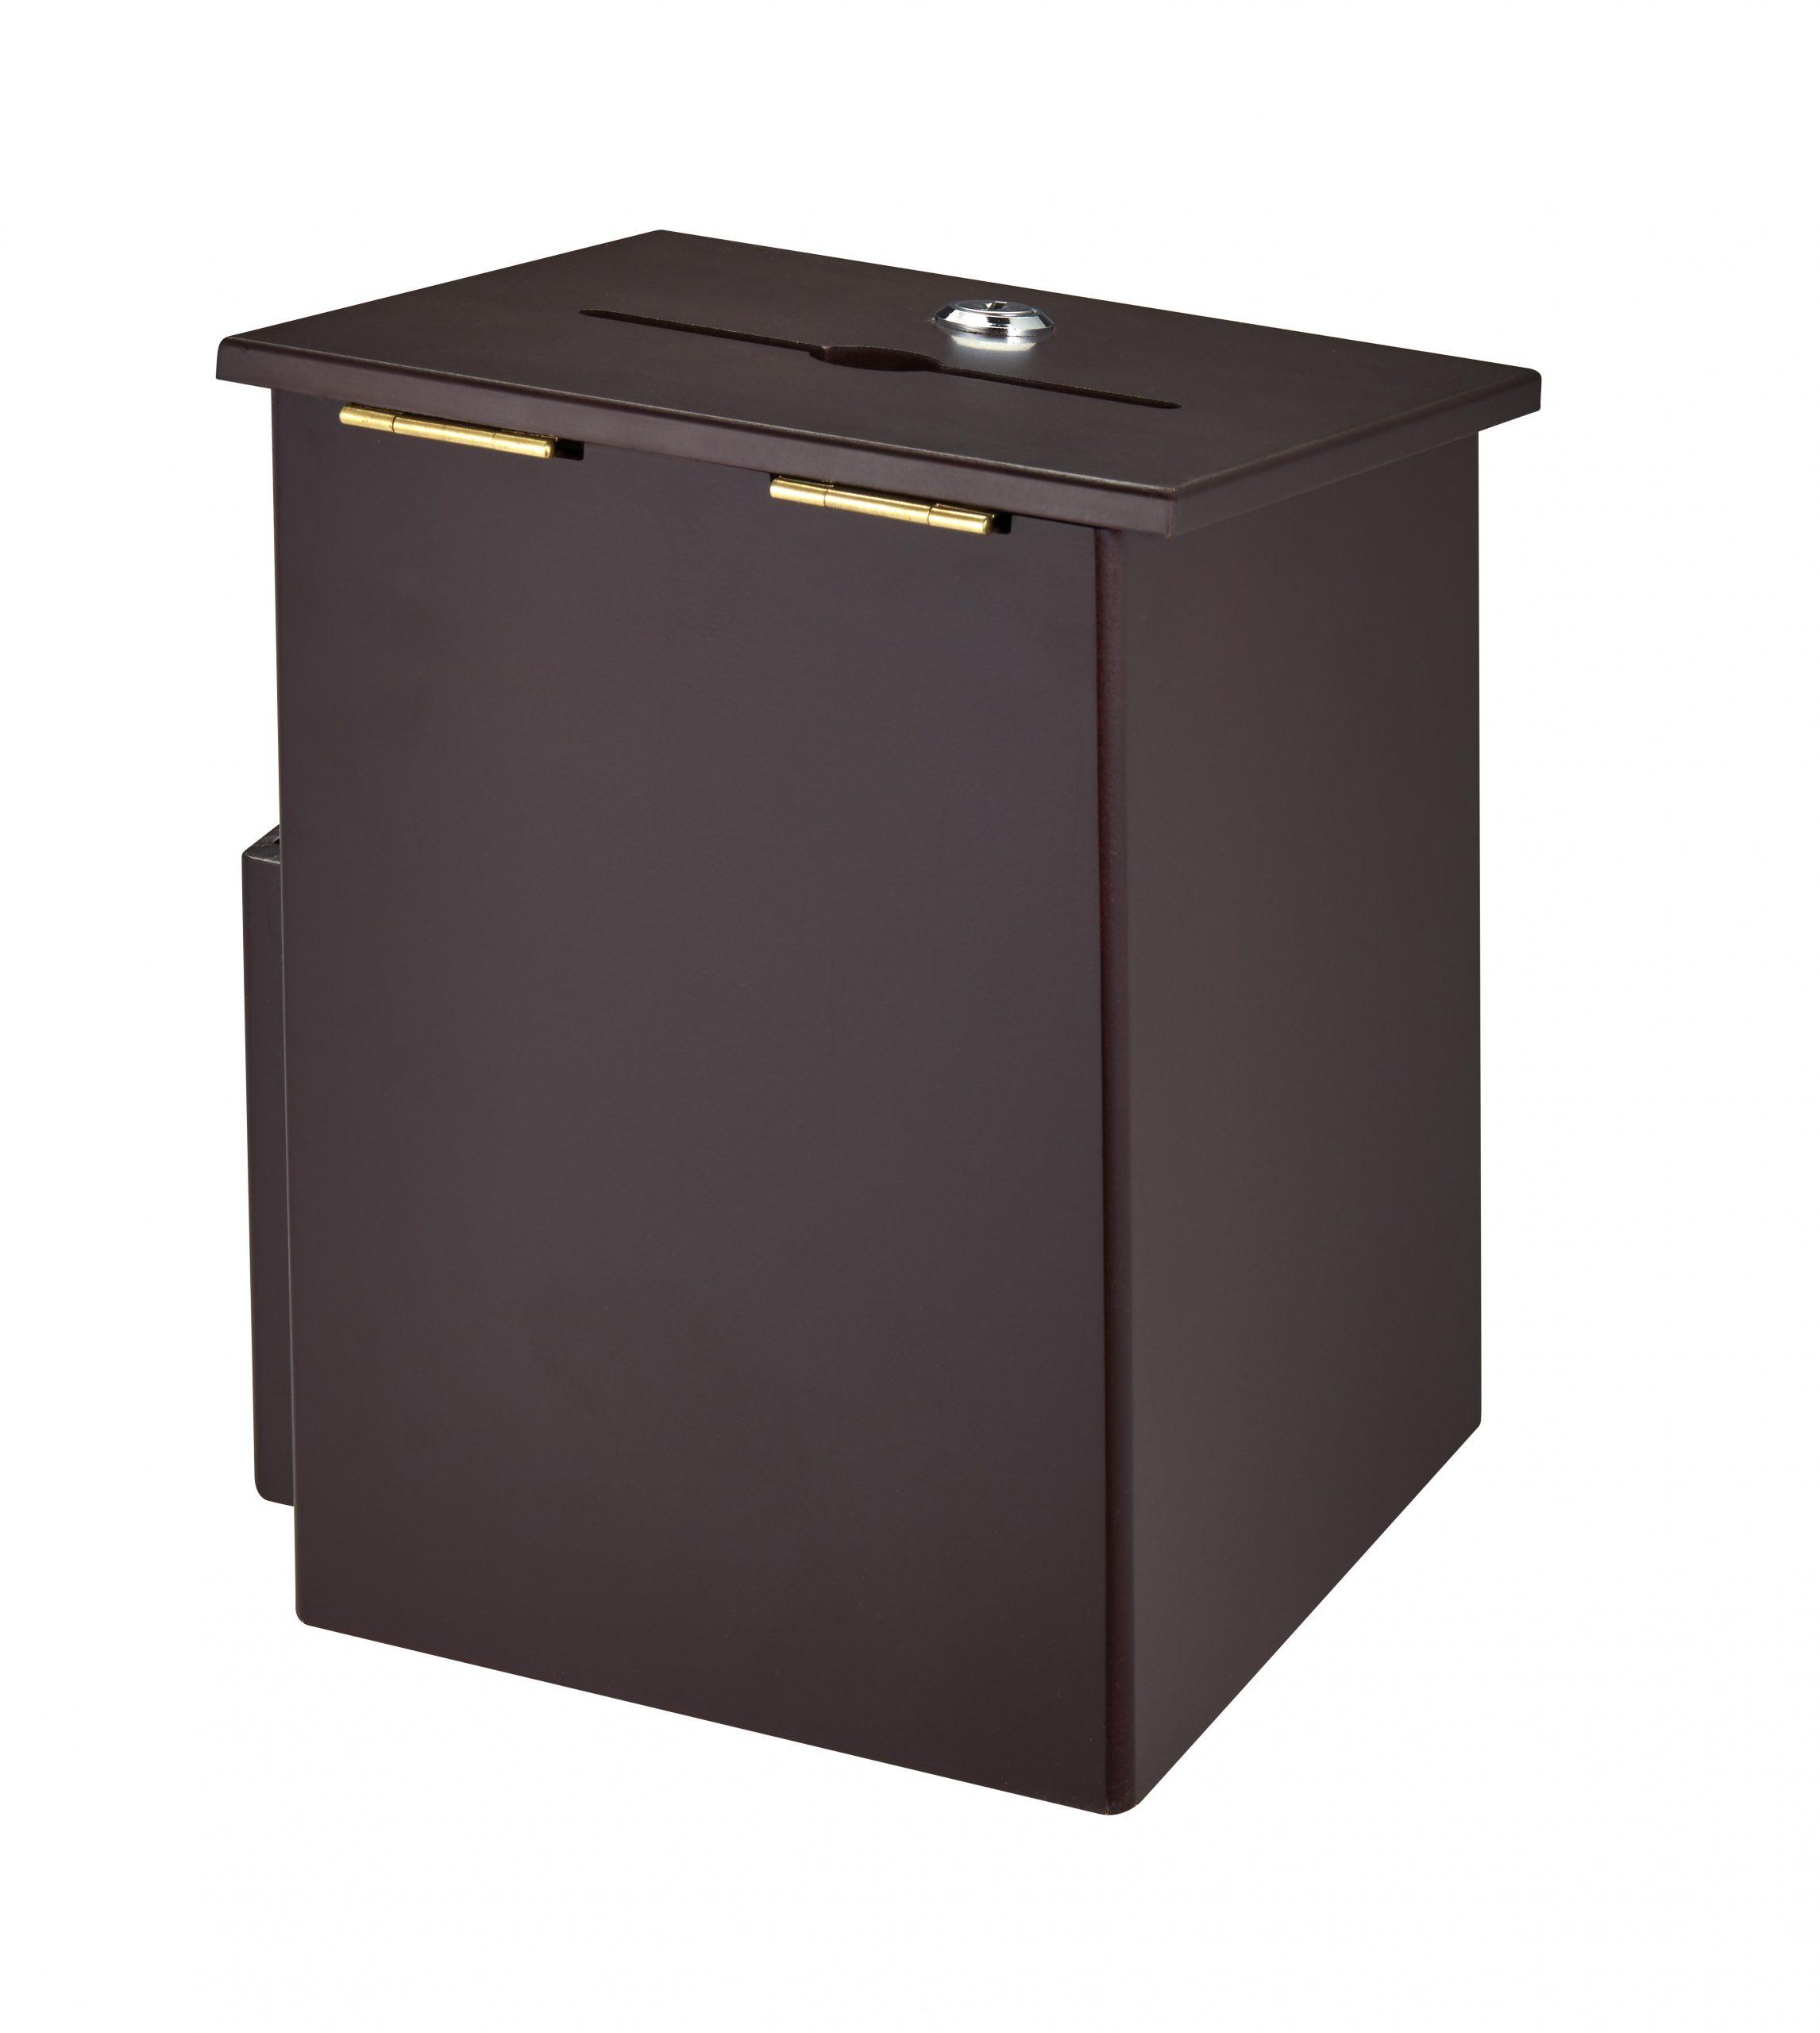 AdirOffice Squared Wood Suggestion Box